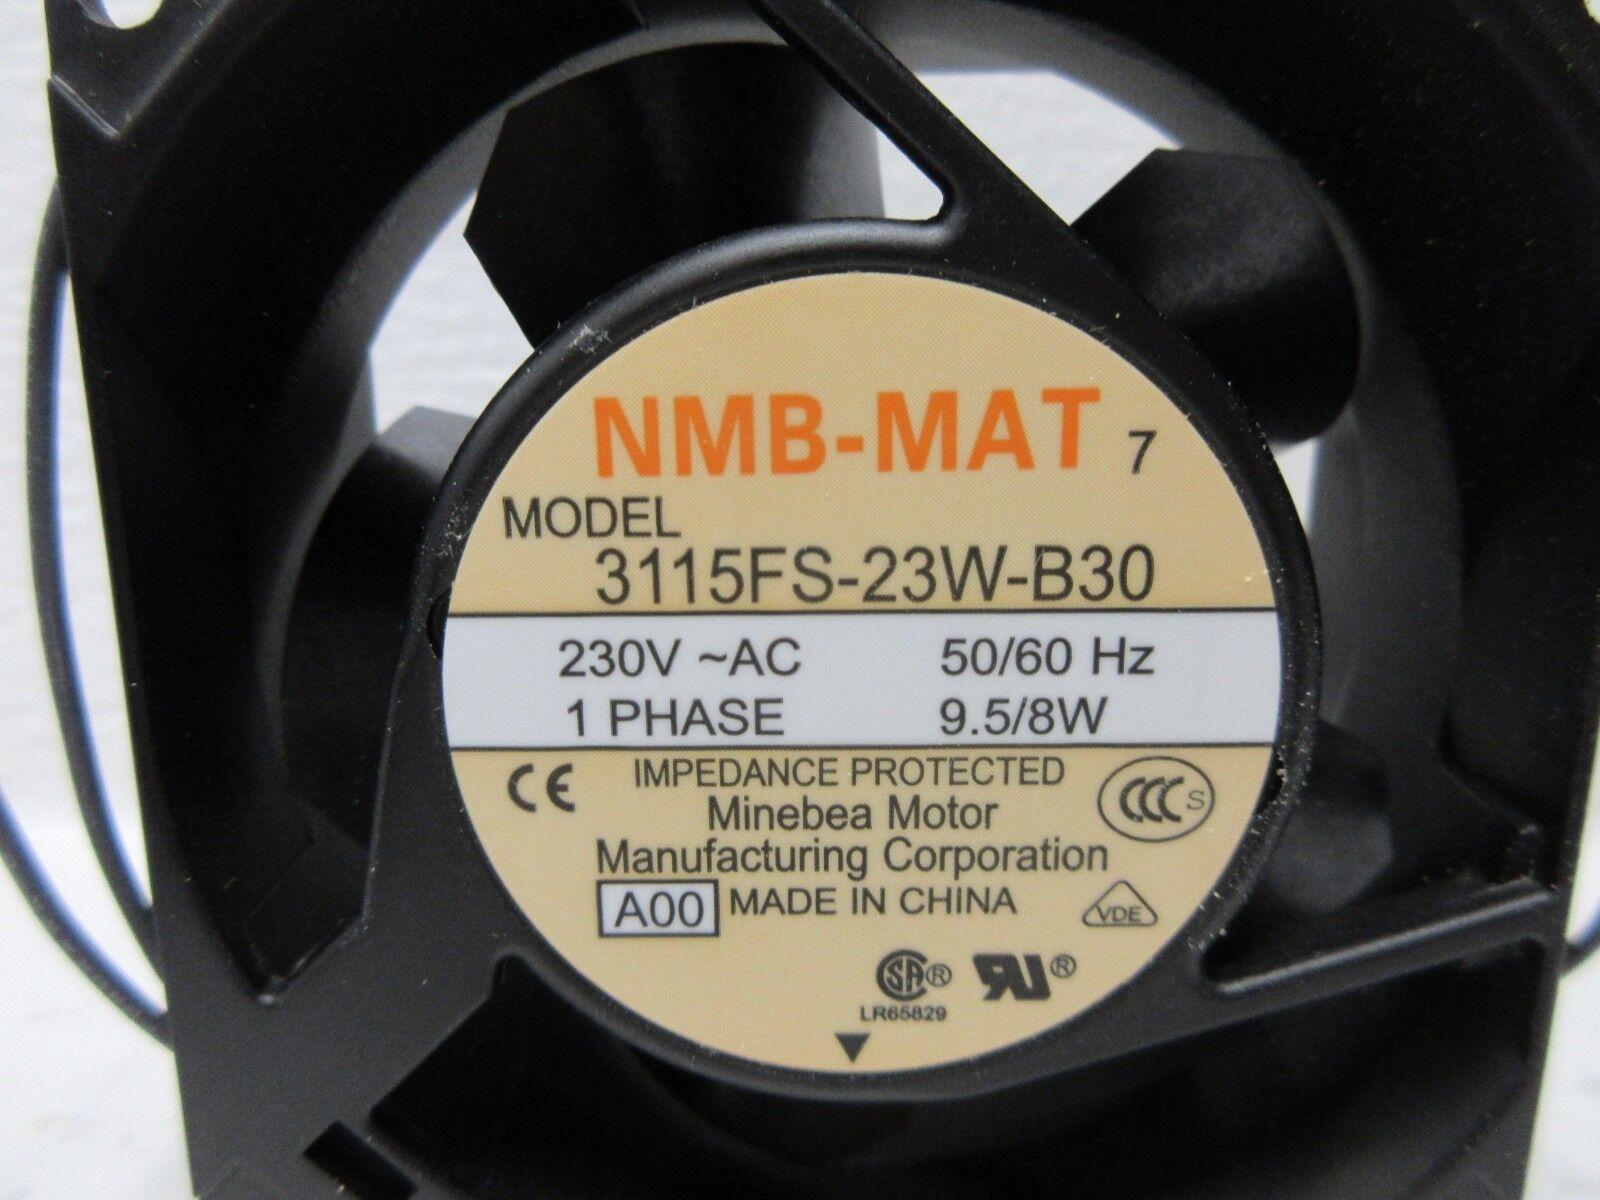 MINEBEA-MATSUSHITA NMB-MAT 4710PS-12T-B30 AXIAL FAN 4710PS12TB30 *NEW NO BOX*